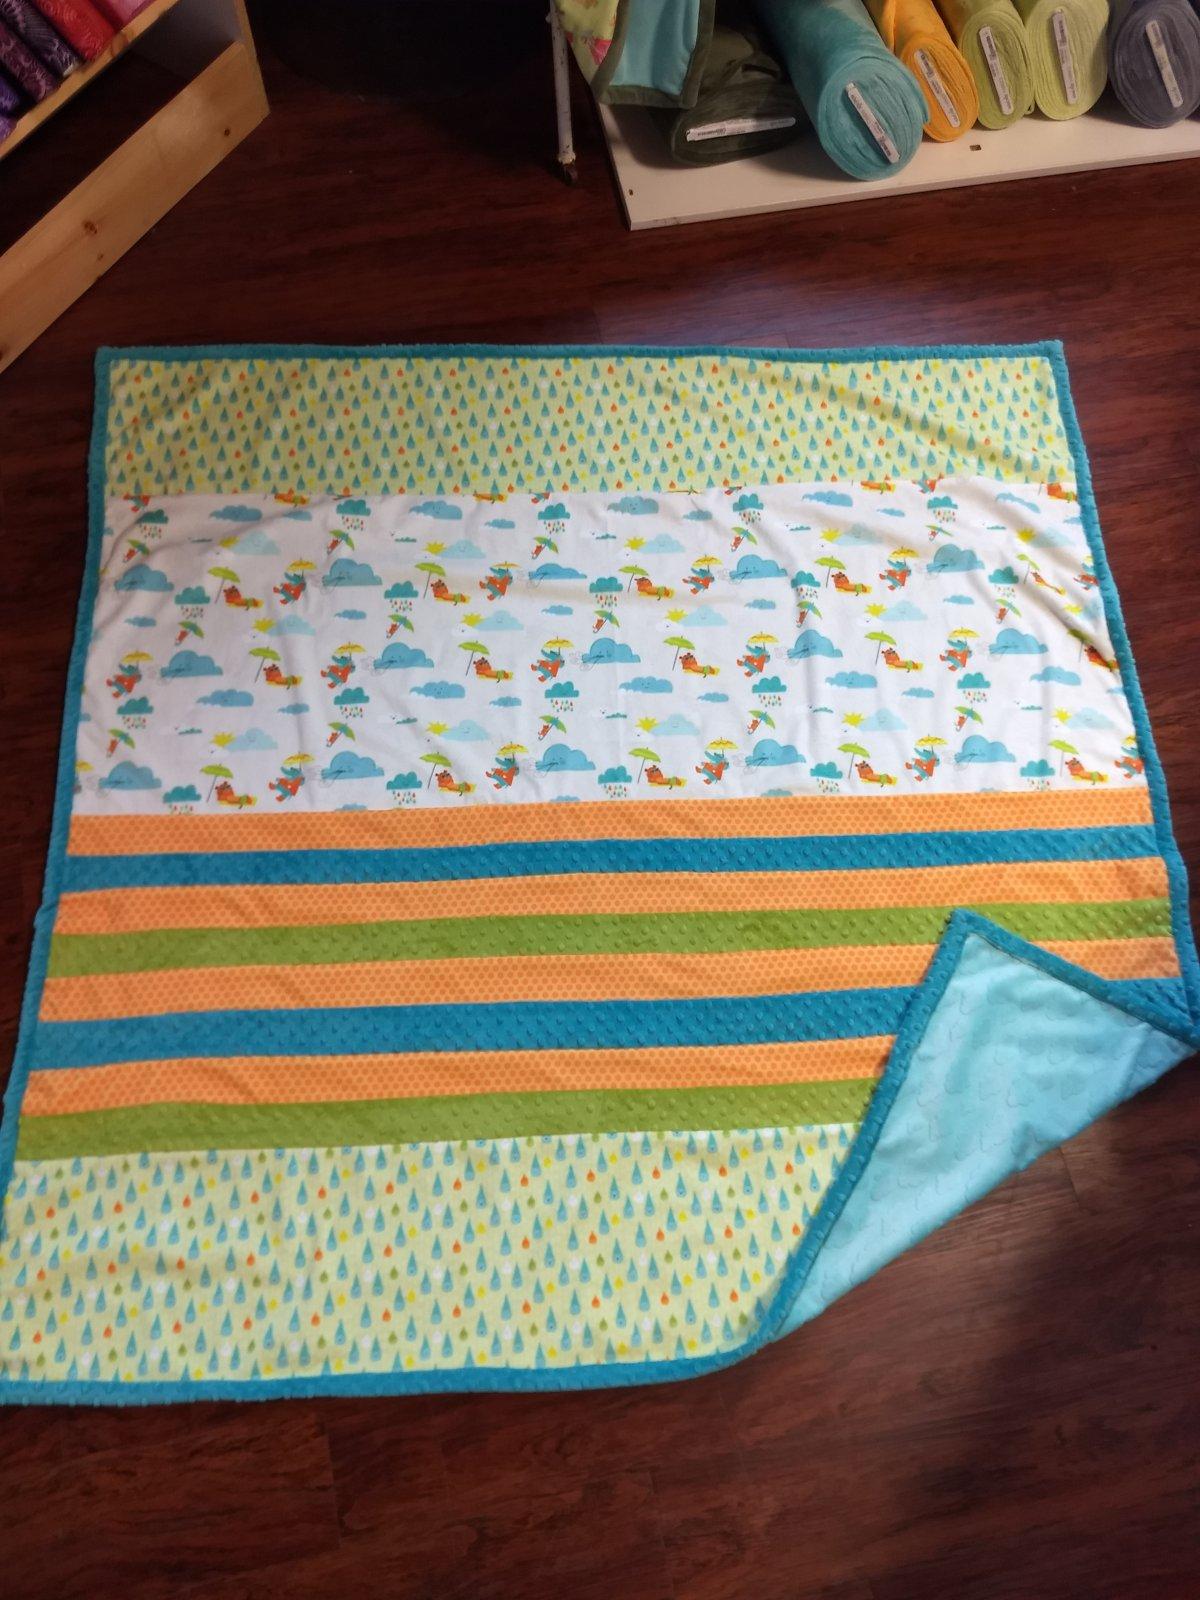 Rainy Days Minky Quilt Kit